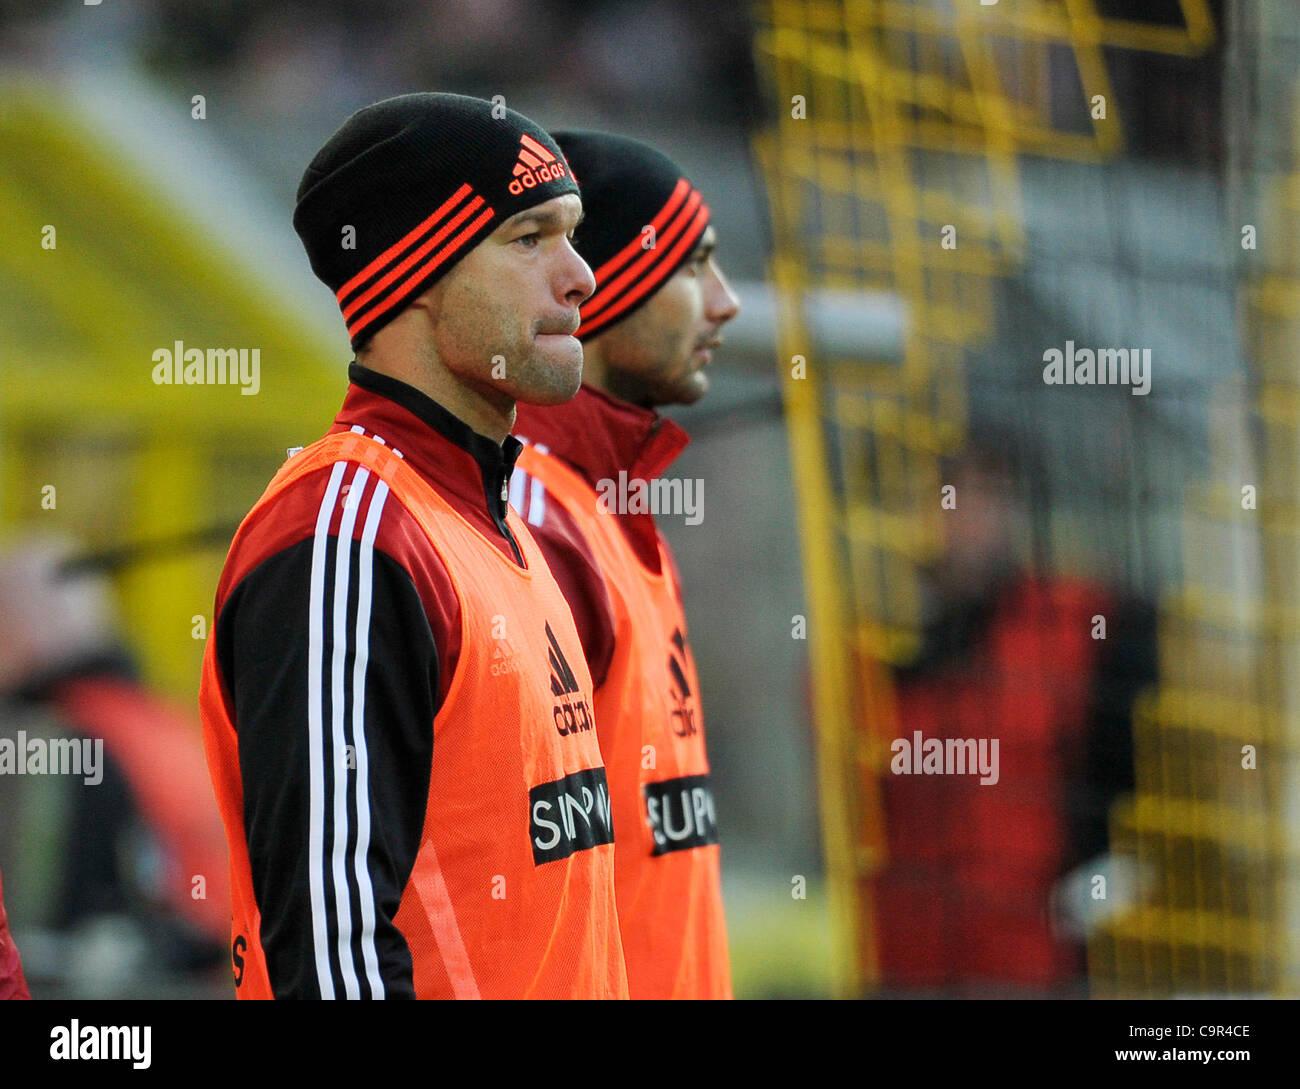 german Bundesliga, 11.02.2012 Borussia Dortmund vs  Bayer 04 Leverkusen ---Michael Ballack (Leverkusen,left) warming - Stock Image